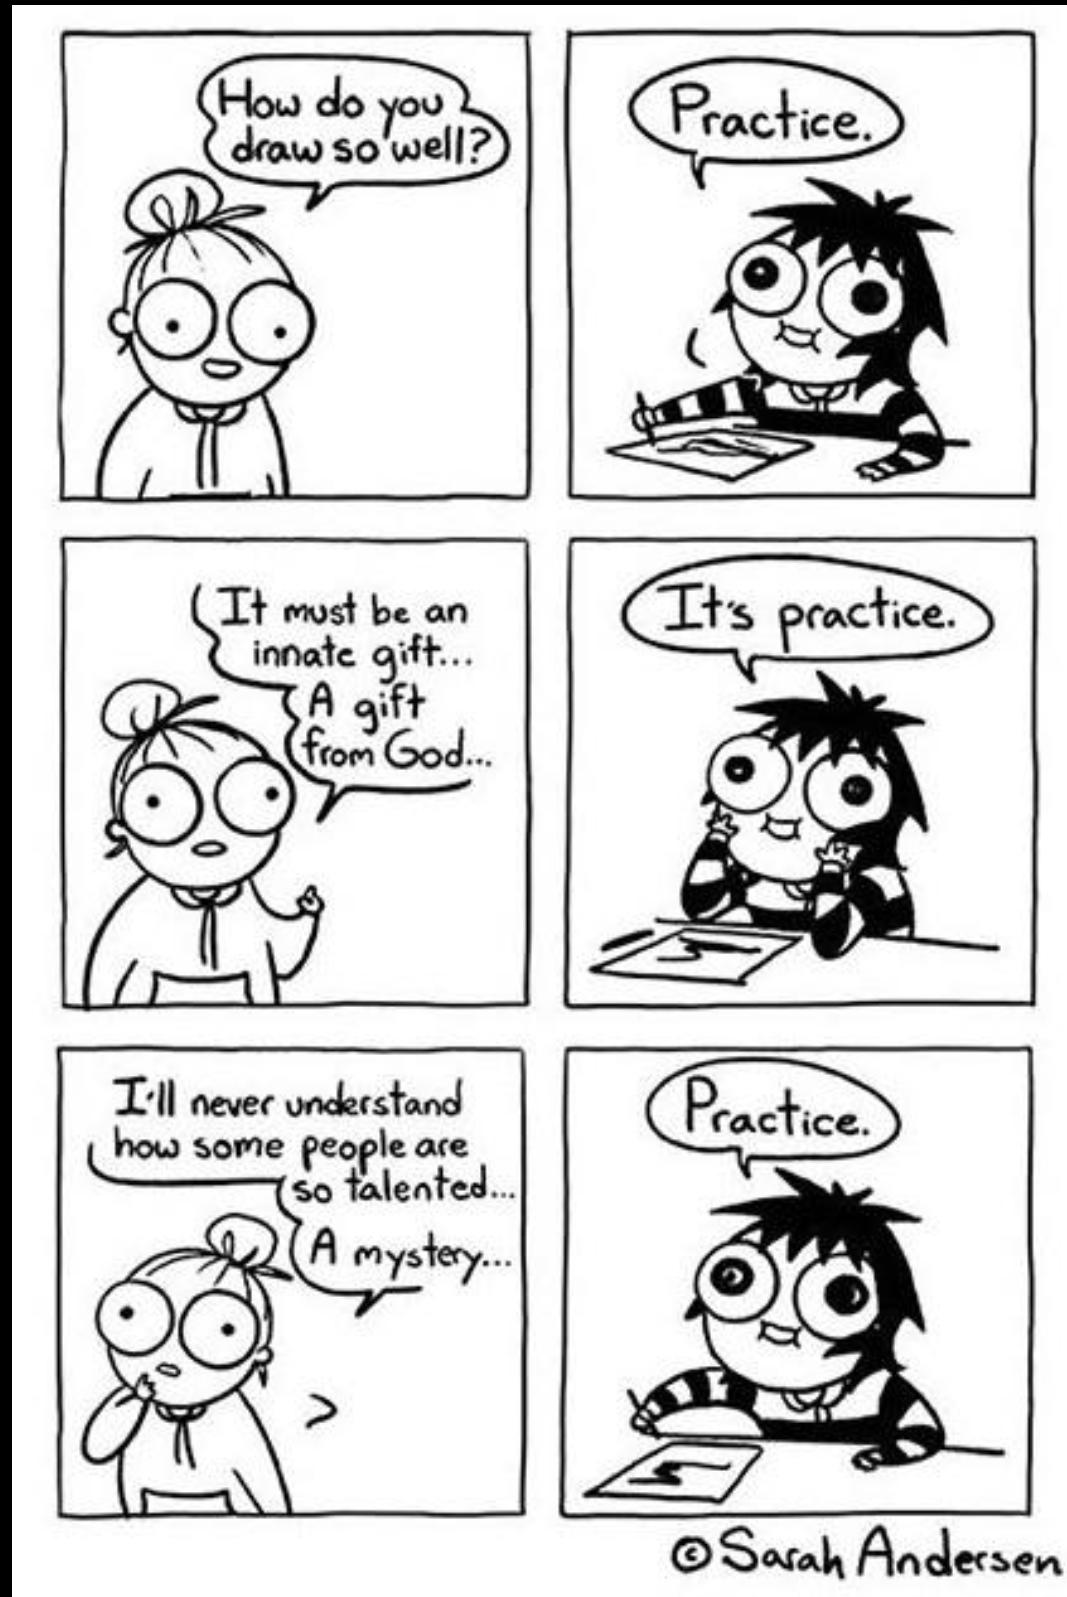 [image] Practice.